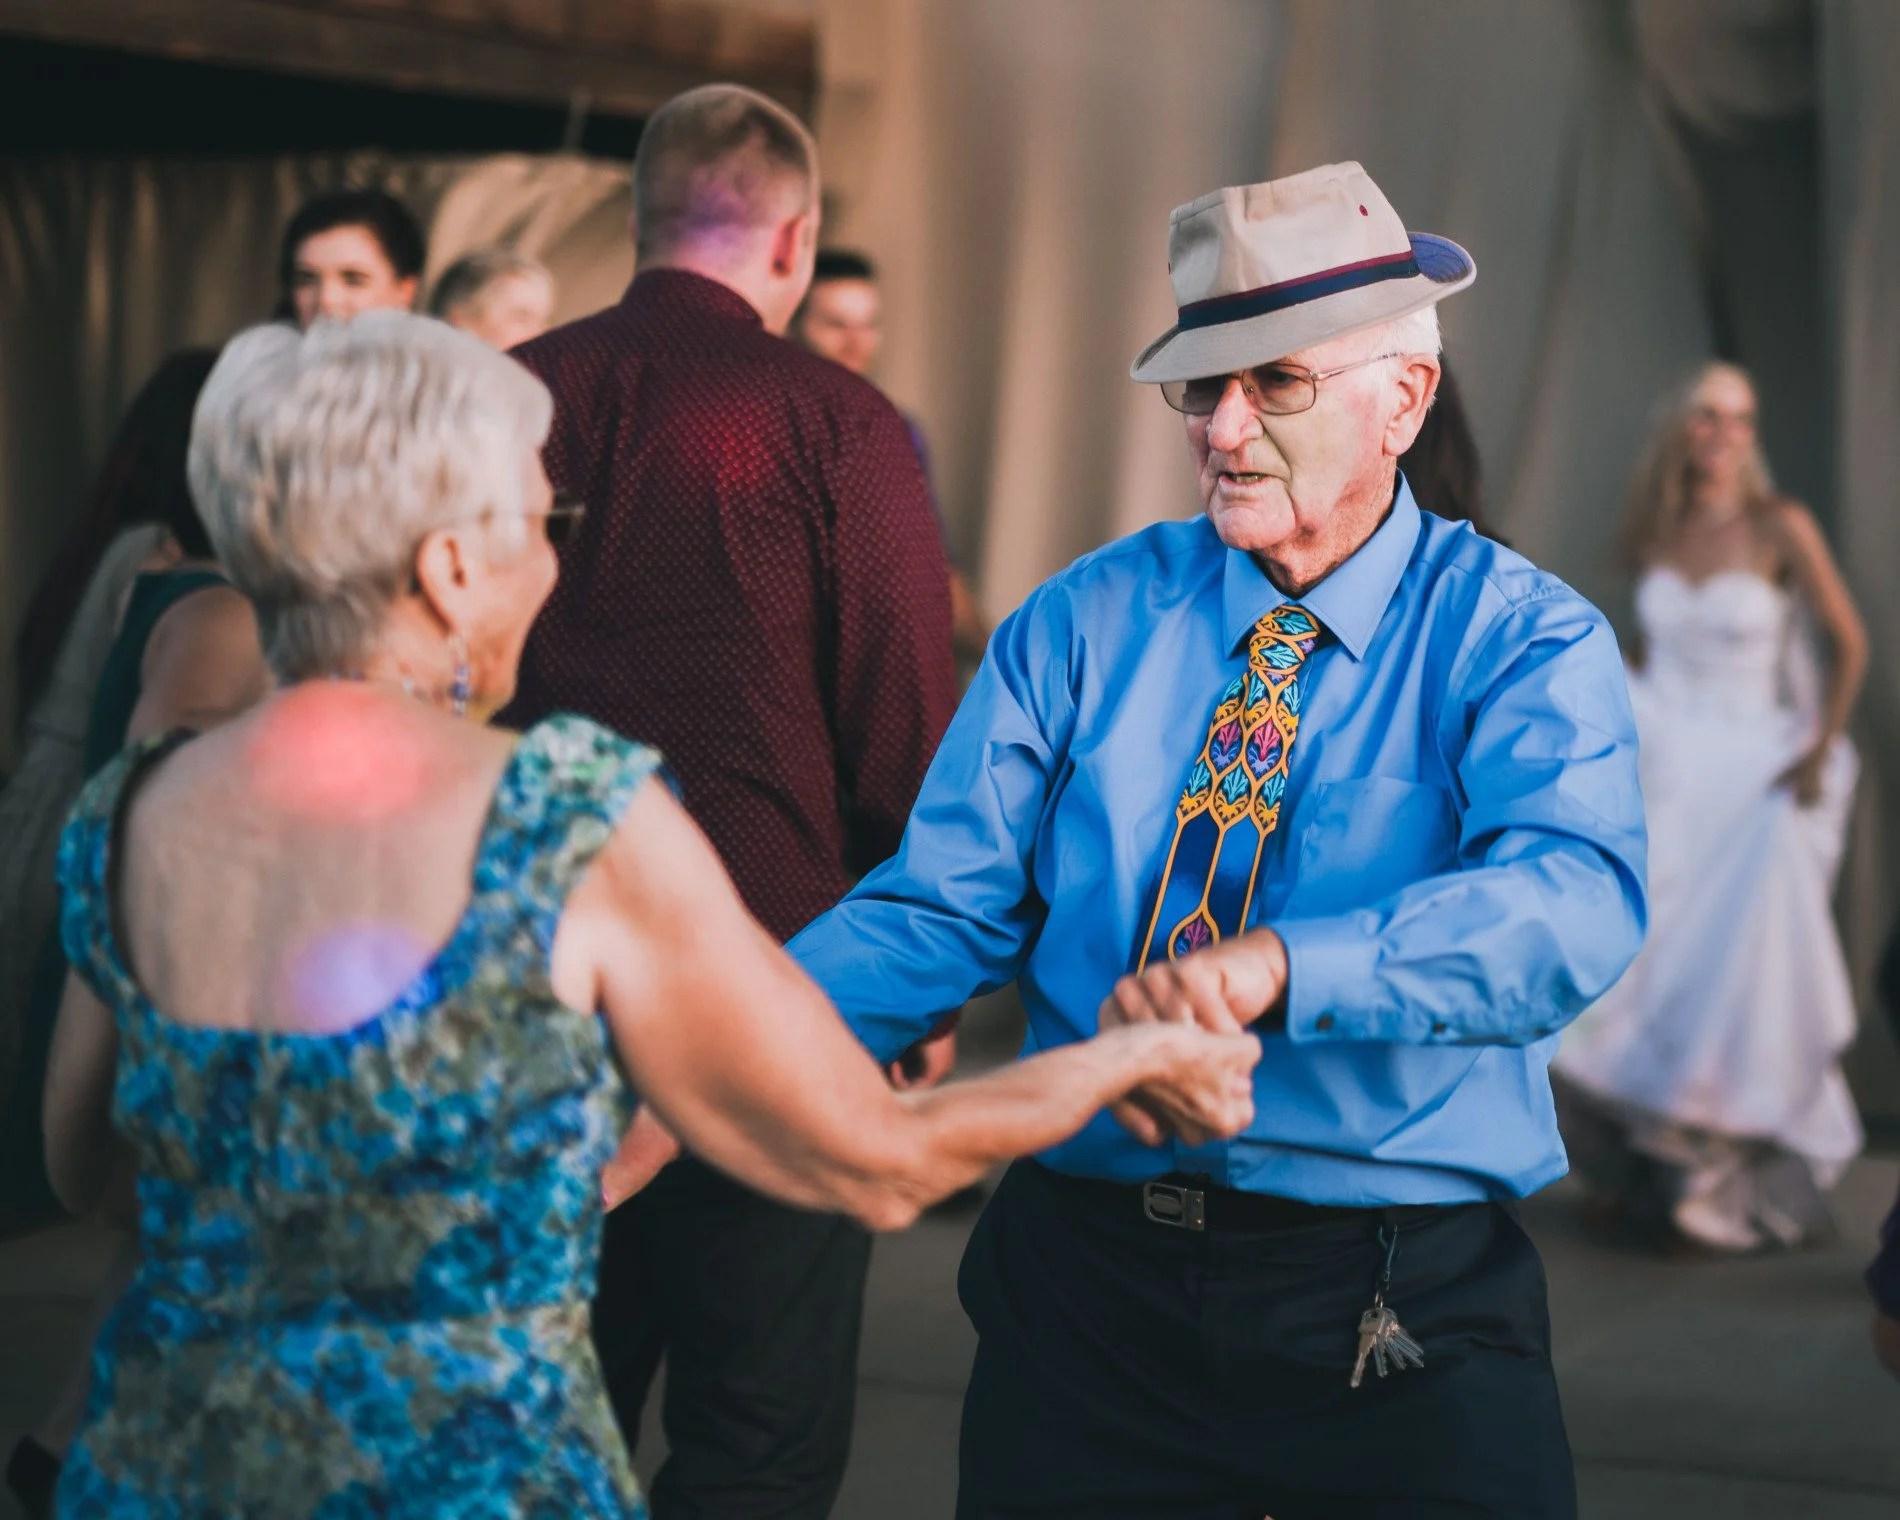 two-seniors-dance-on-the-dance-floor_t20_LA4WBn